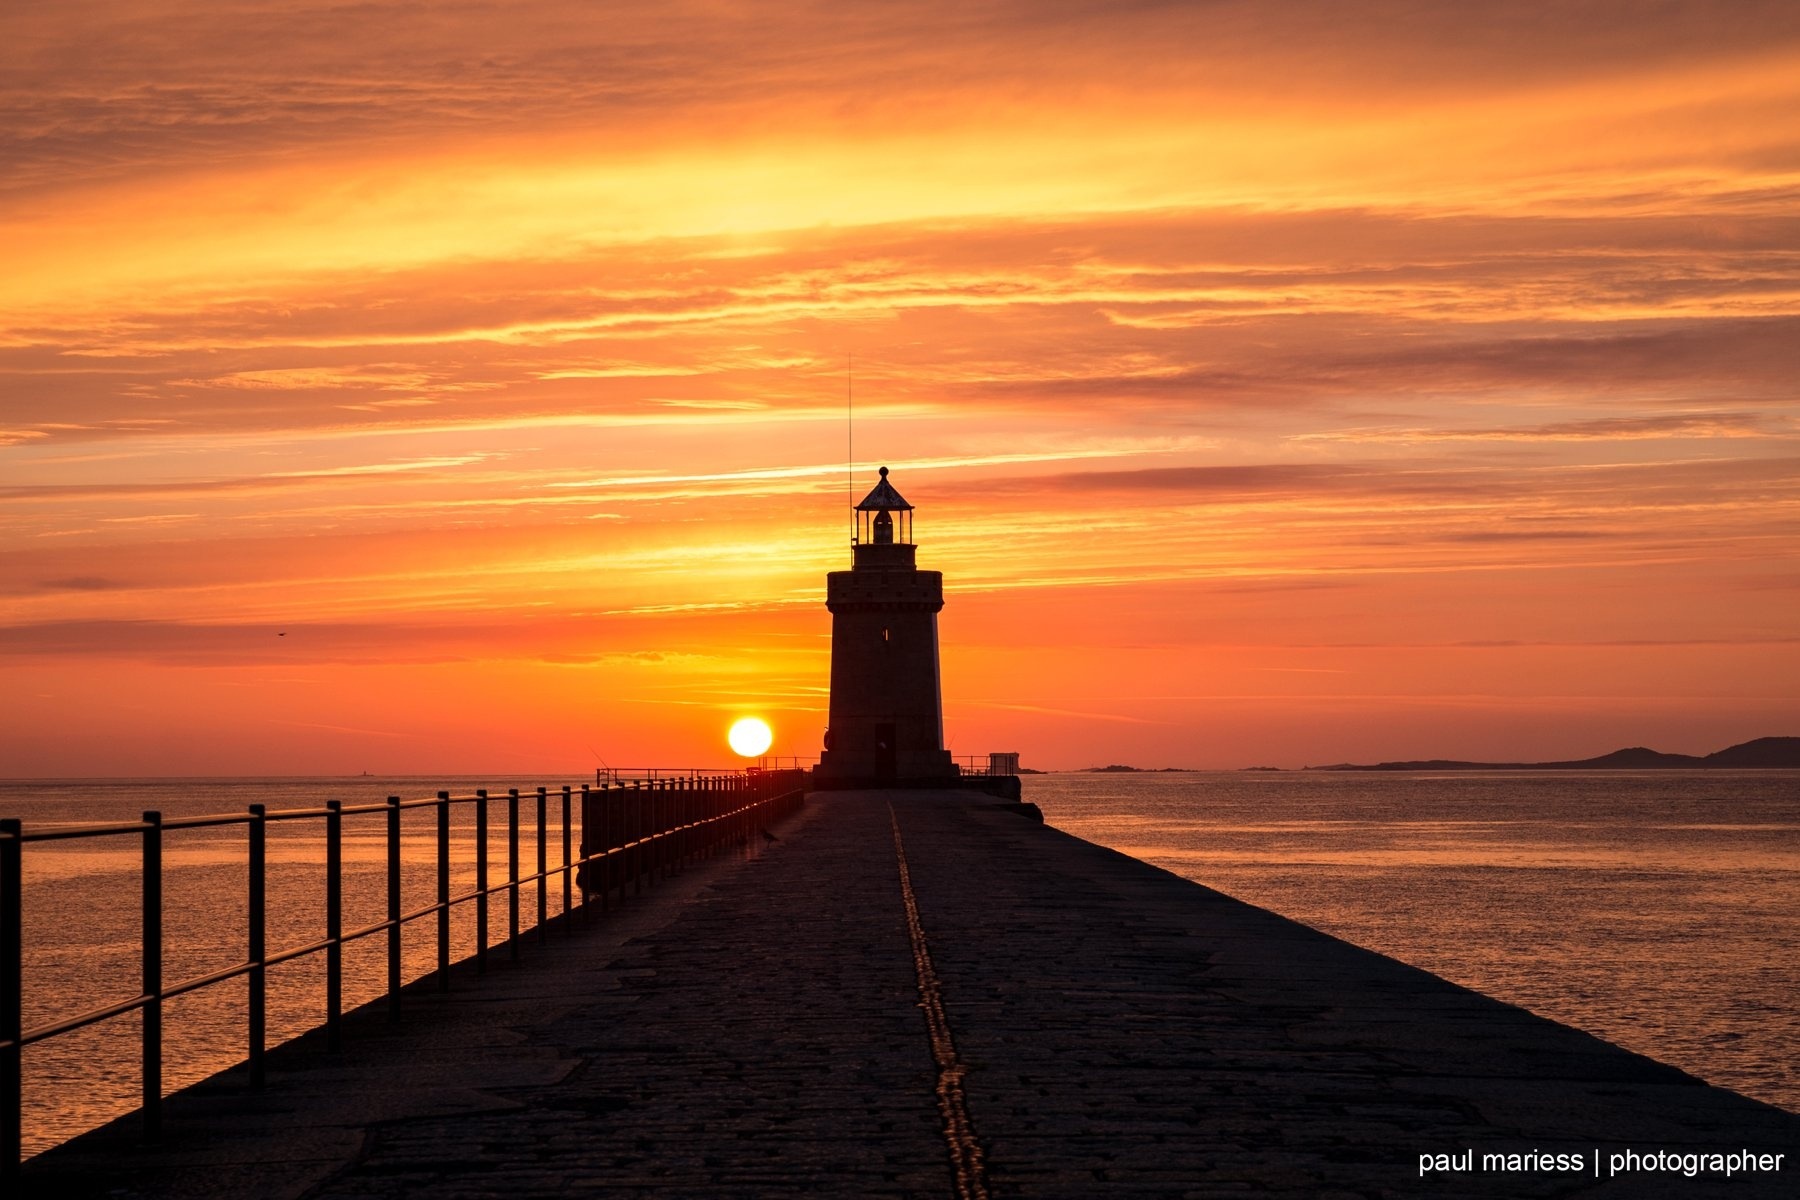 Solstice Sunrise by paul mariess